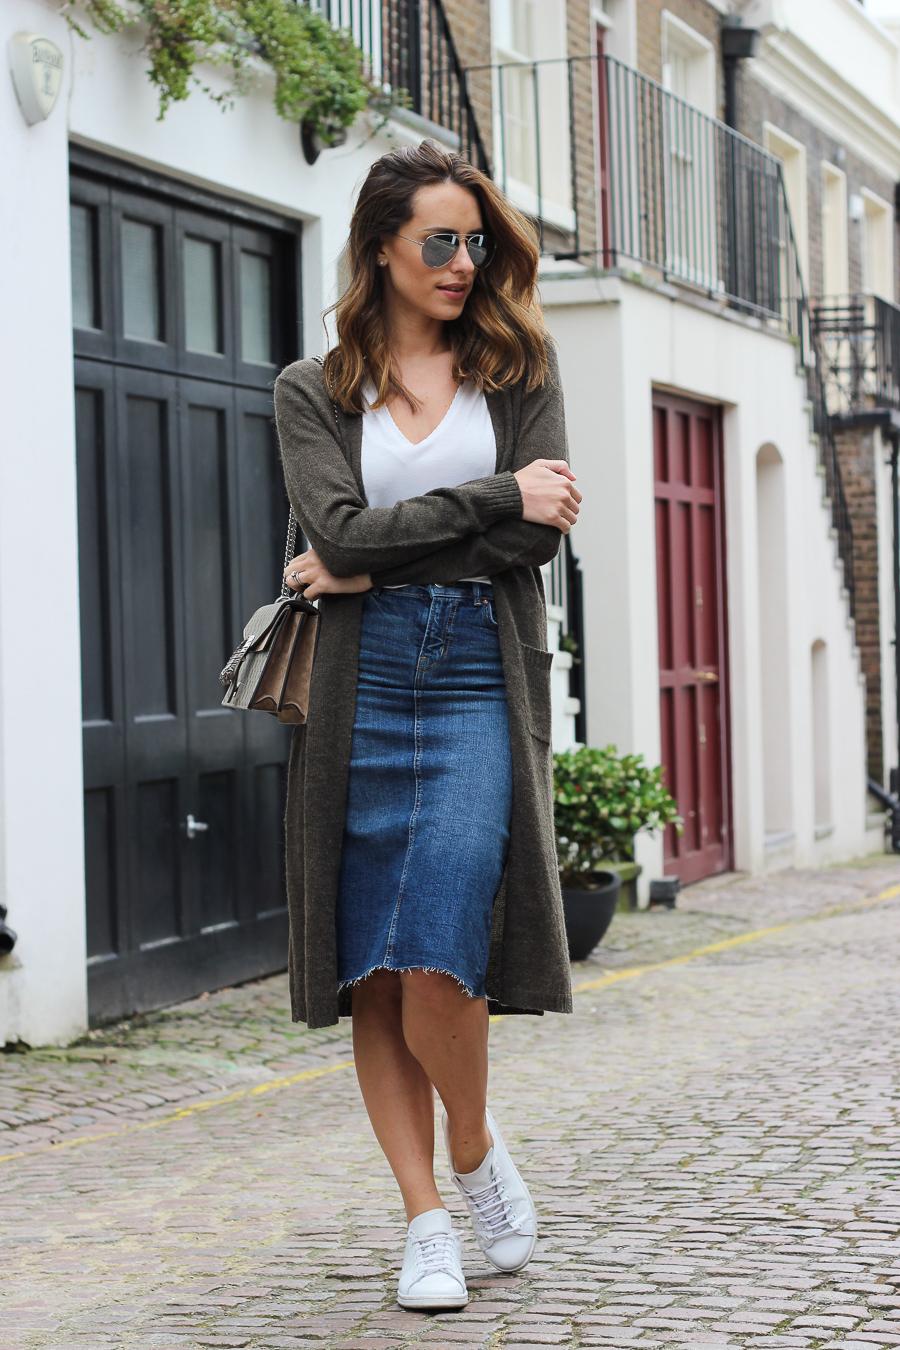 Clutch and carry on - uk fashion blogger - uk travel blogger - sabrina chakici - matalan cardigan, zara denim midi skirt, gucci dionysus supreme-6